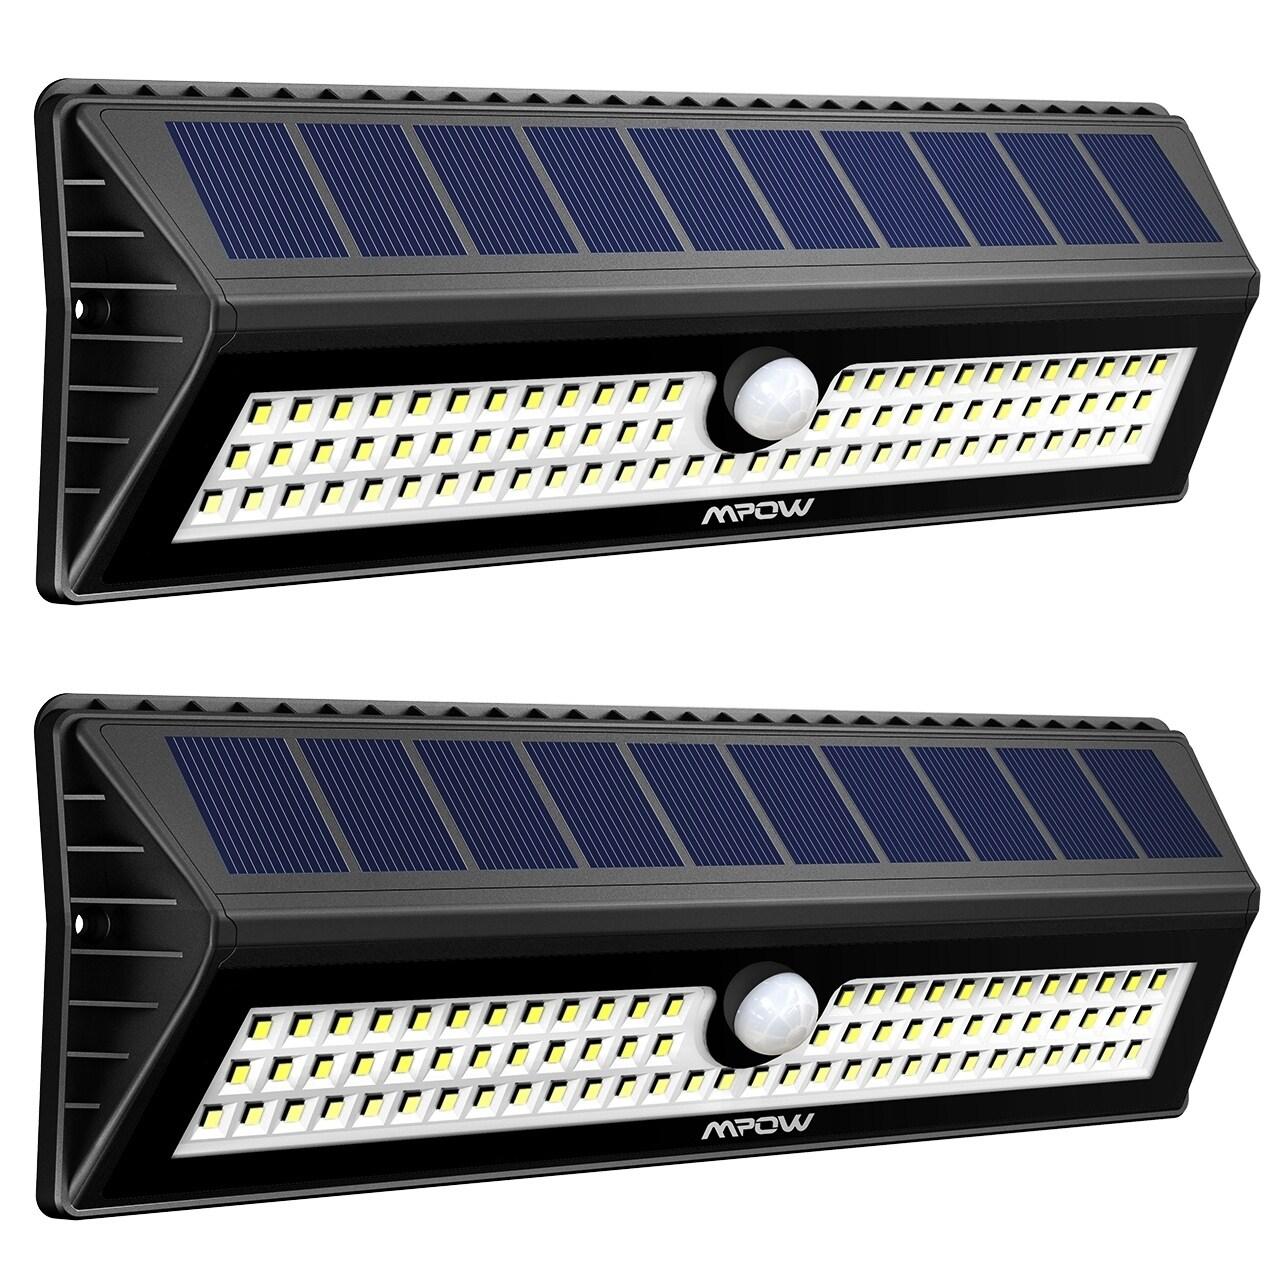 Mpow 77 LED Motion Sensor Solar Light, Bright Wall Light ...